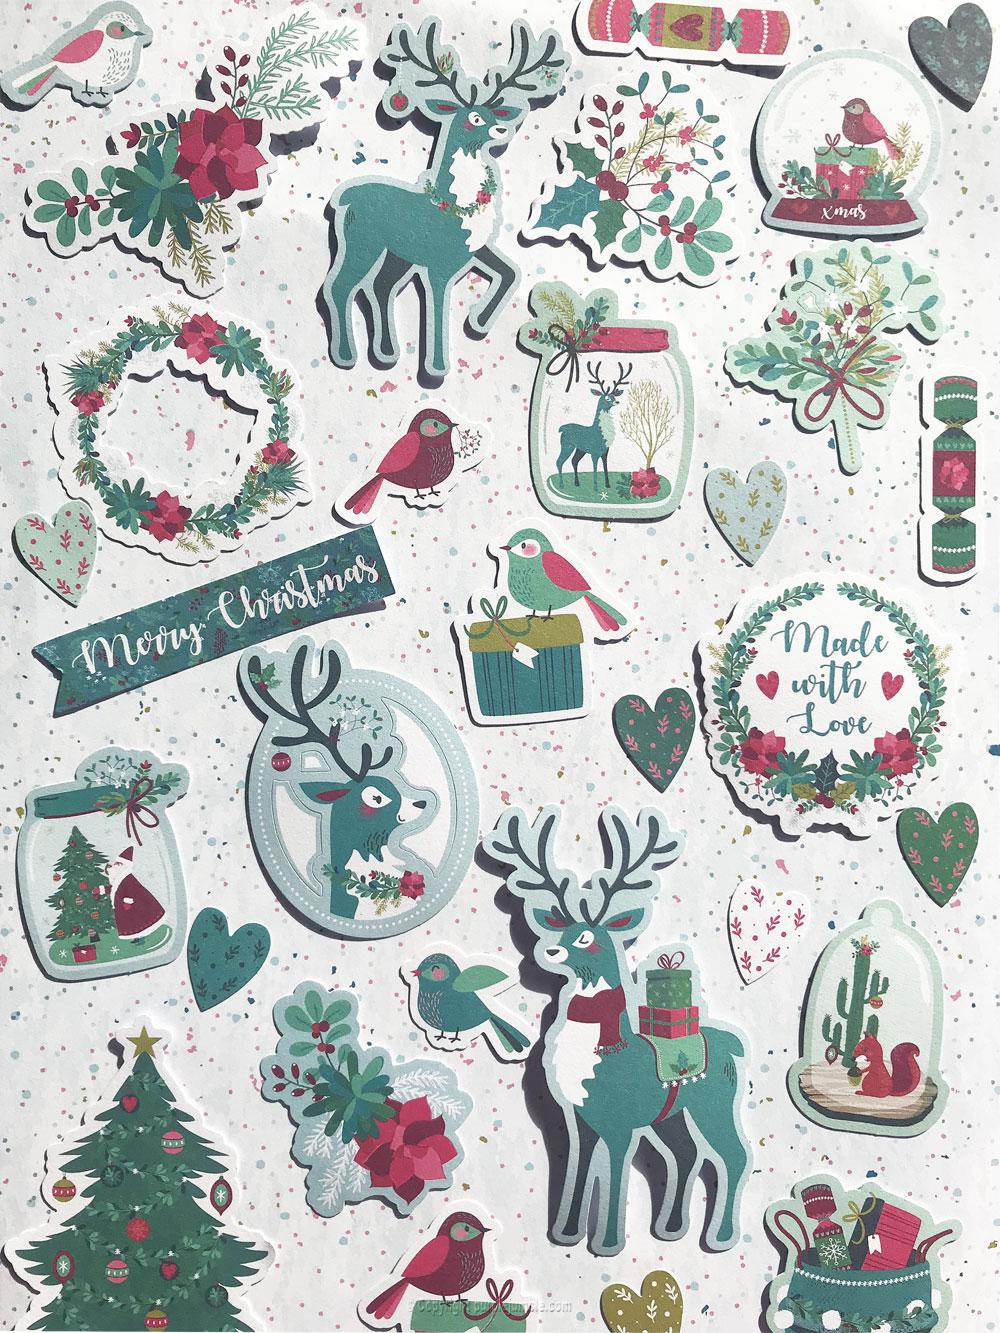 diy décor Noël papier dies cut